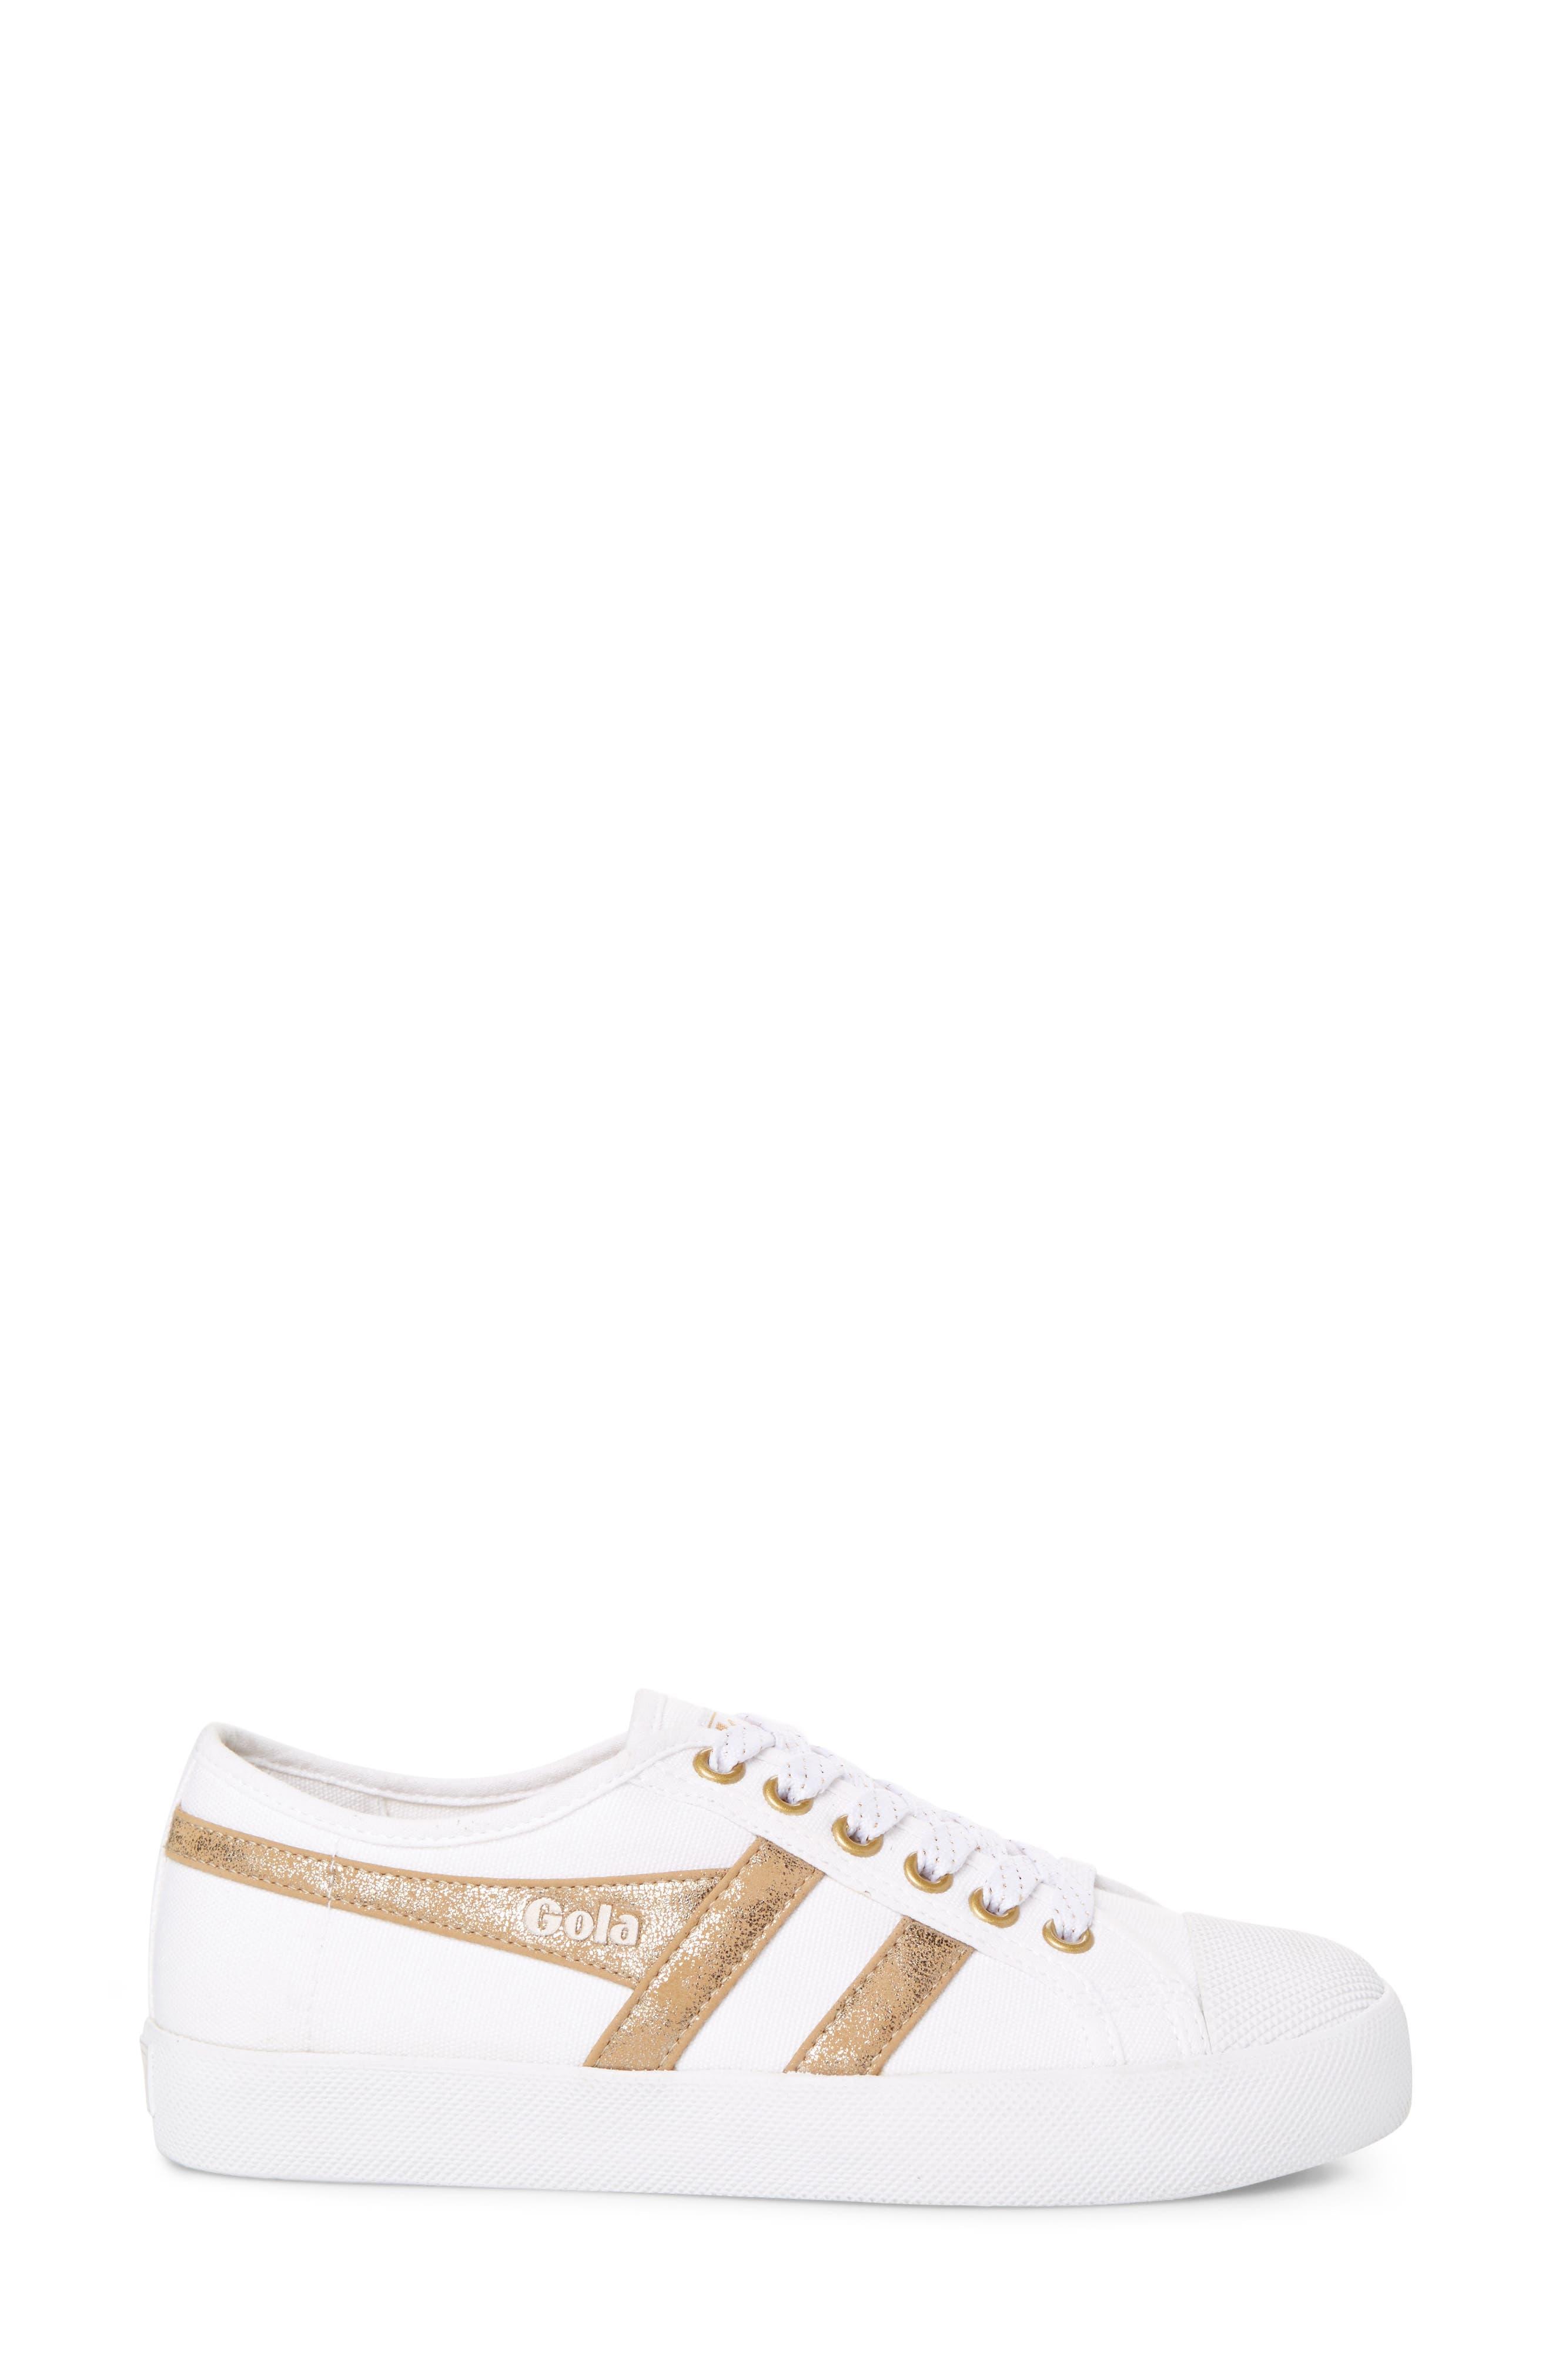 Coaster Mirror Sneaker,                             Alternate thumbnail 3, color,                             White/ Gold